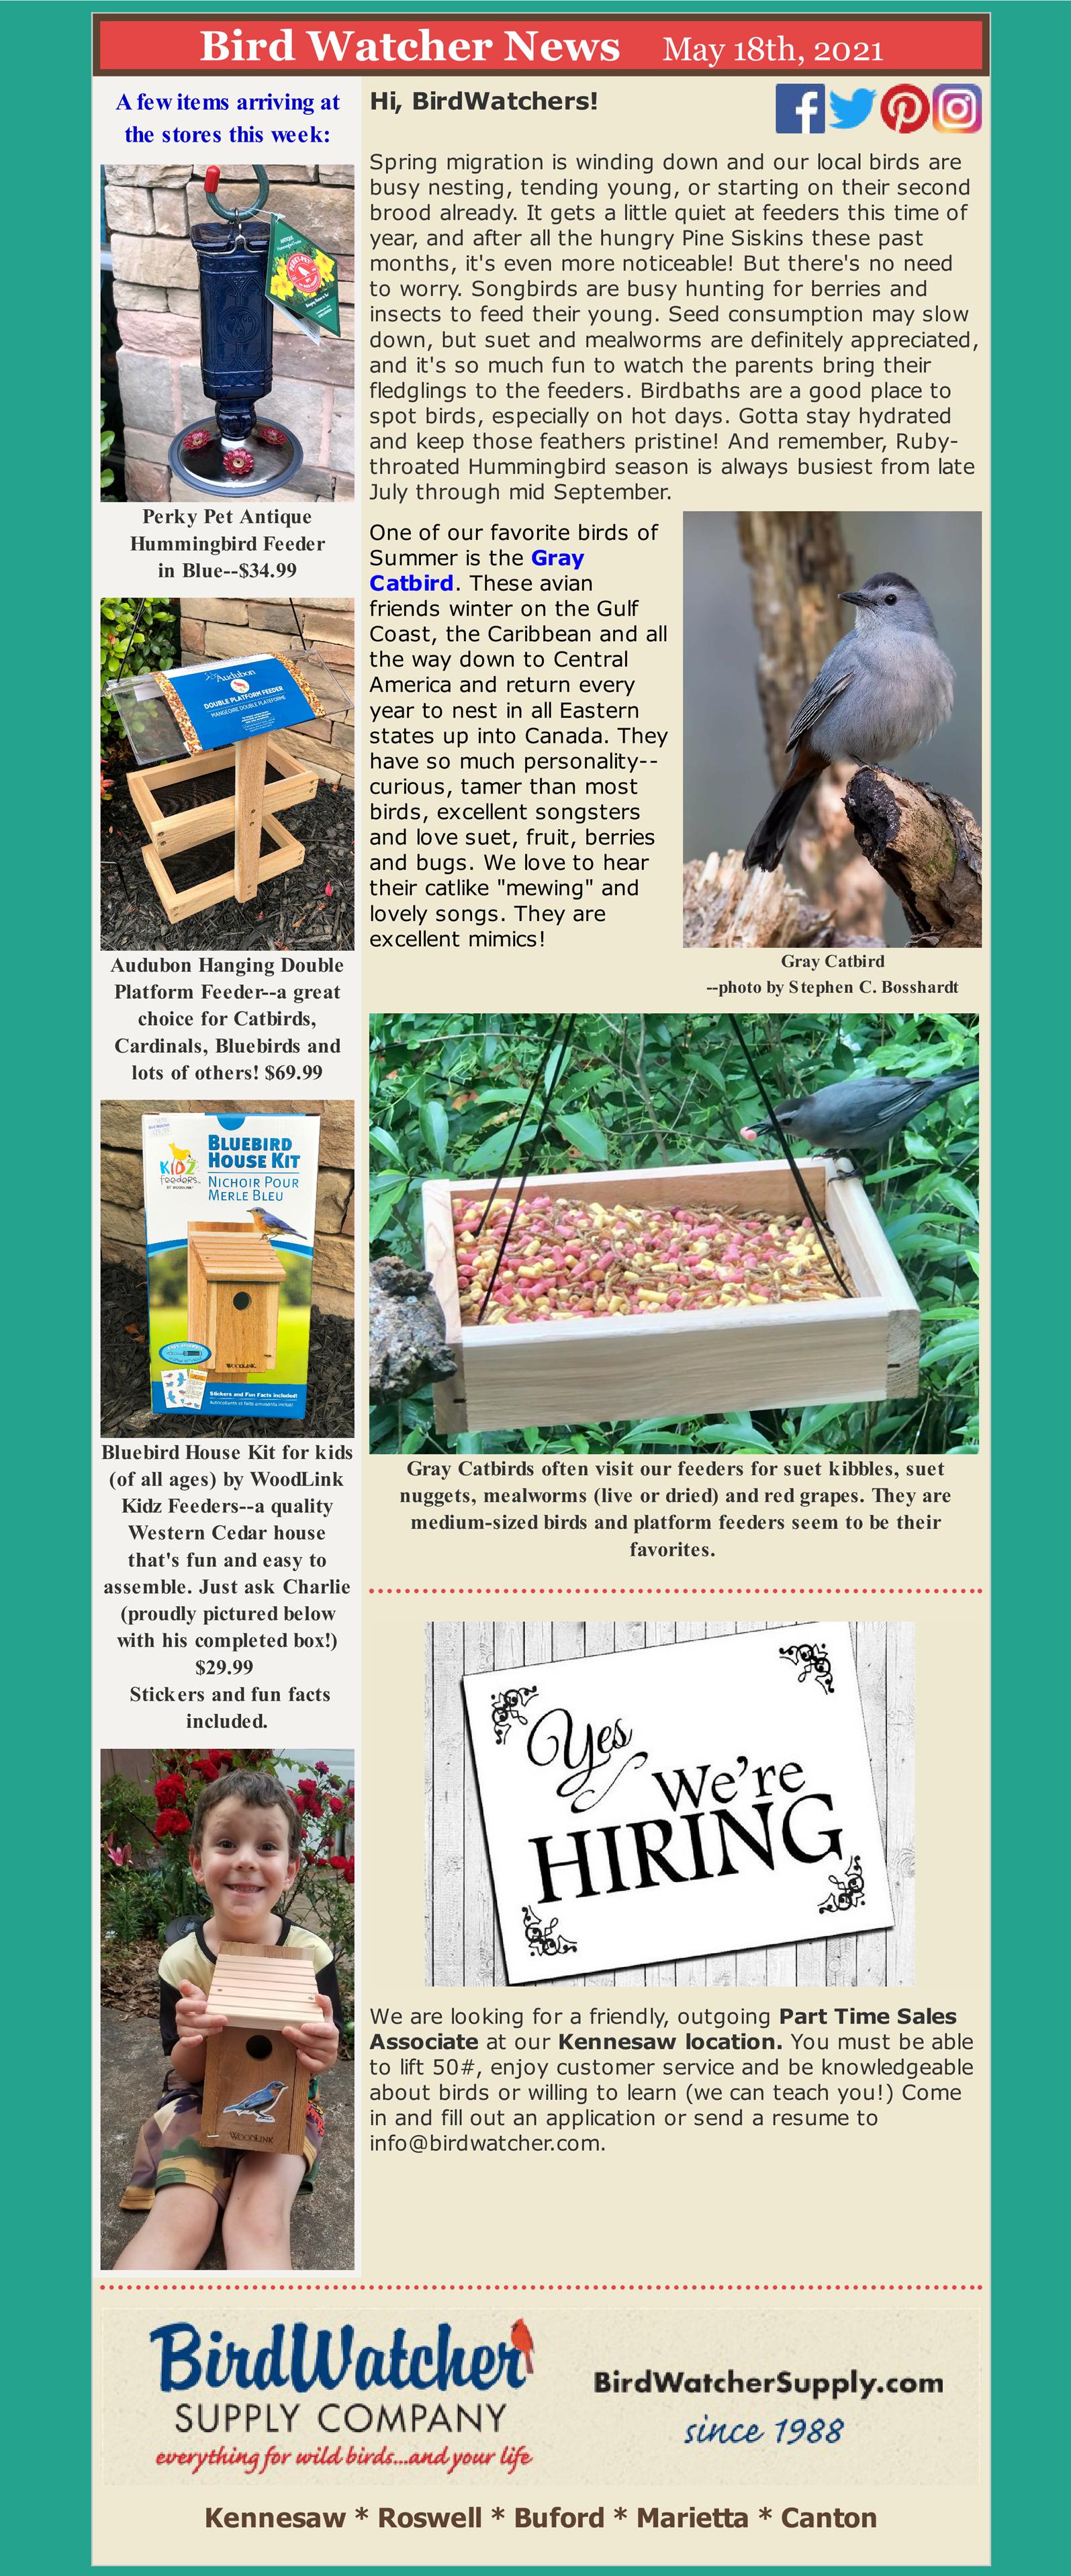 birdfeeders, garden, help wanted, suet, catbirds, mealworms, suet nuggets, suet kibbles, cole's wild bird products, hummers